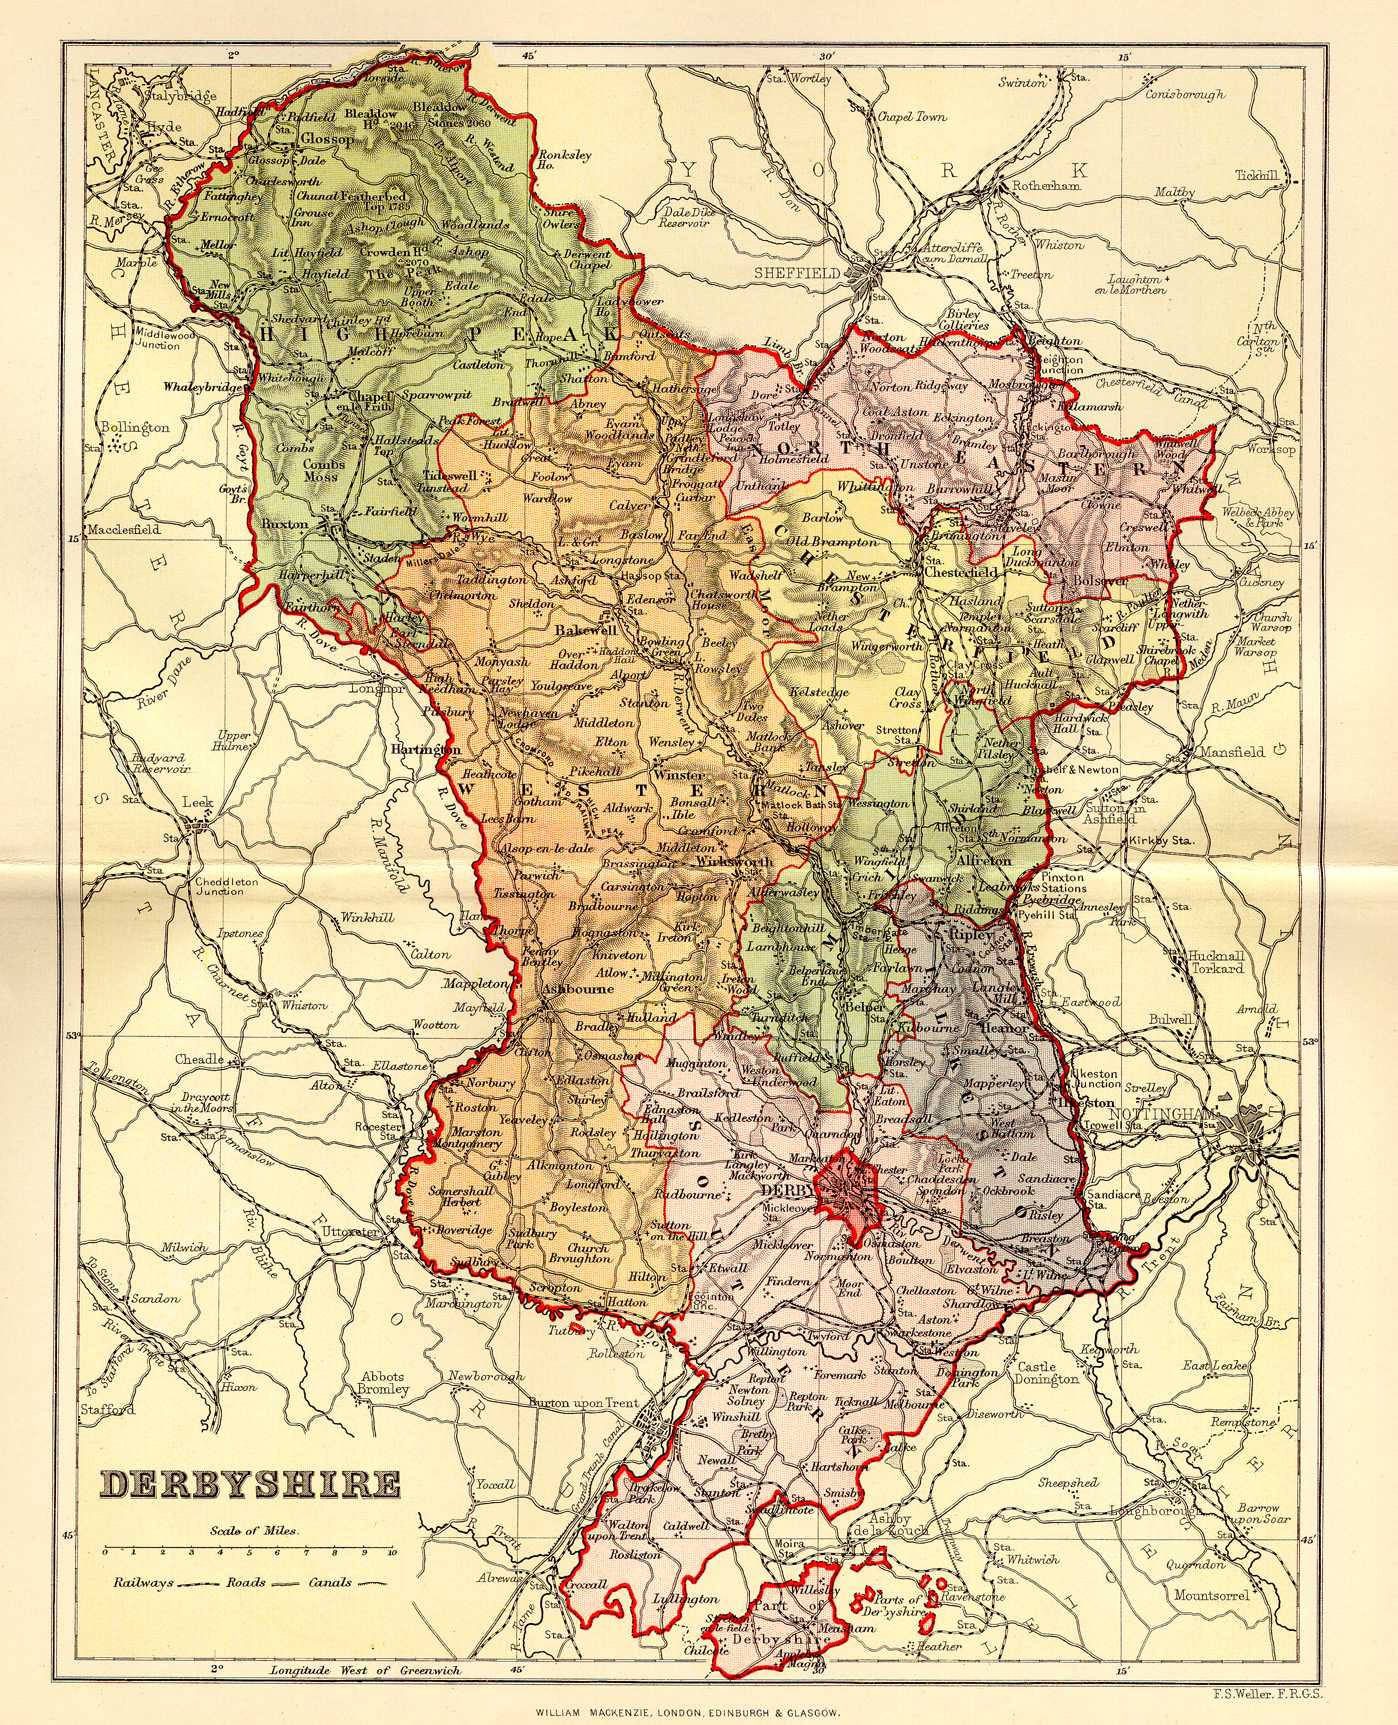 Derbyshire Genealogy Heraldry And Family History